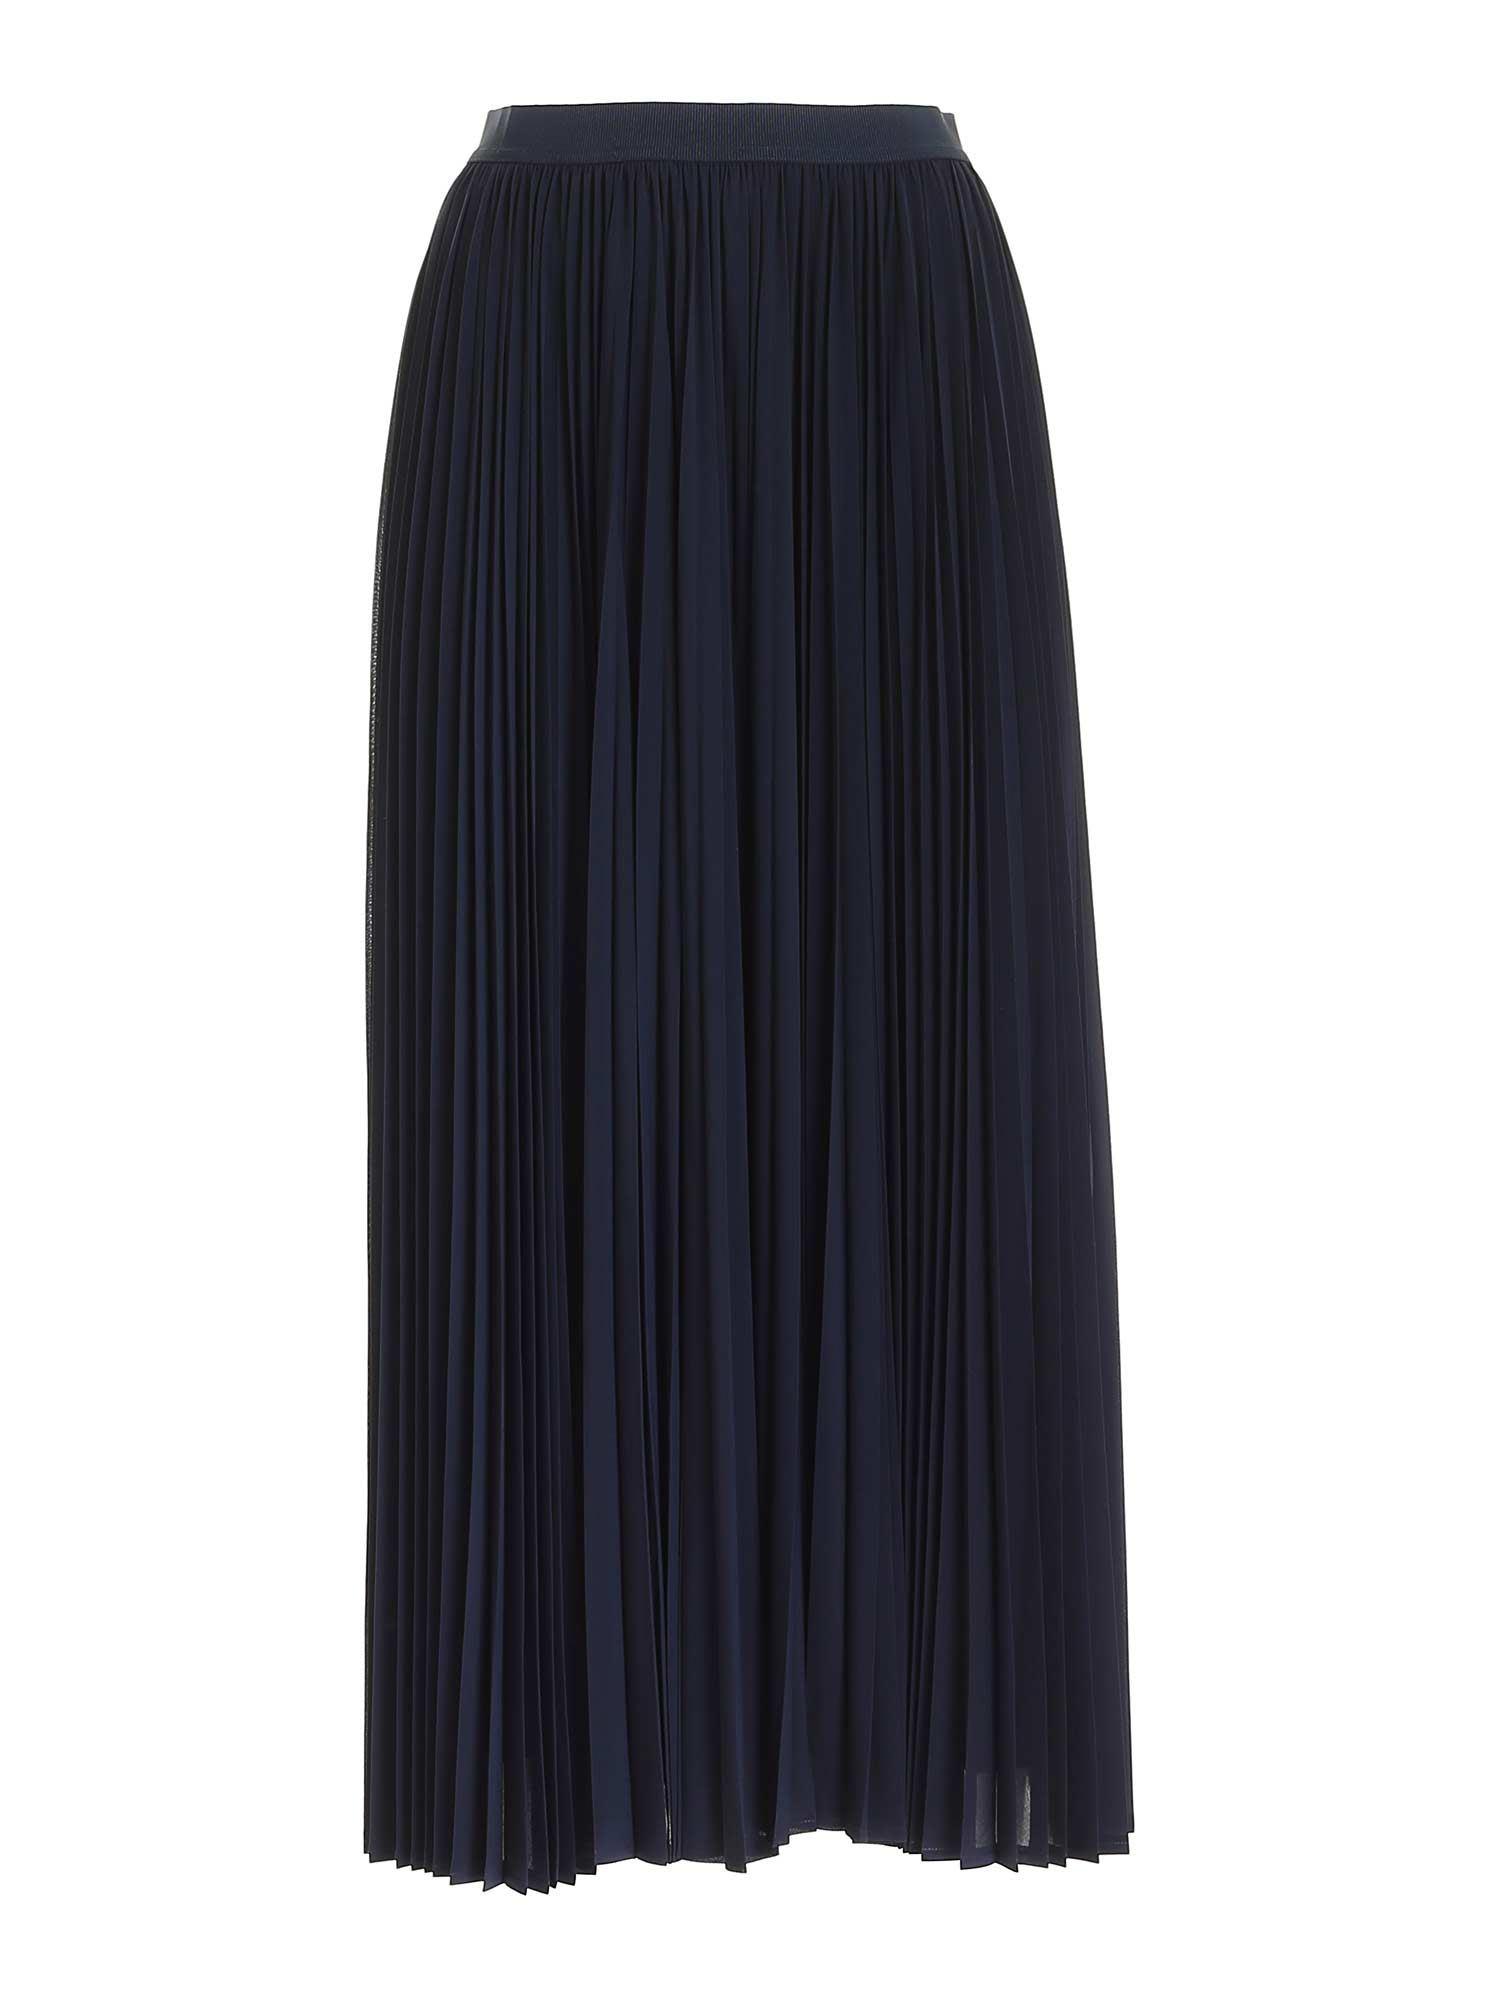 Weekend Max Mara Skirt